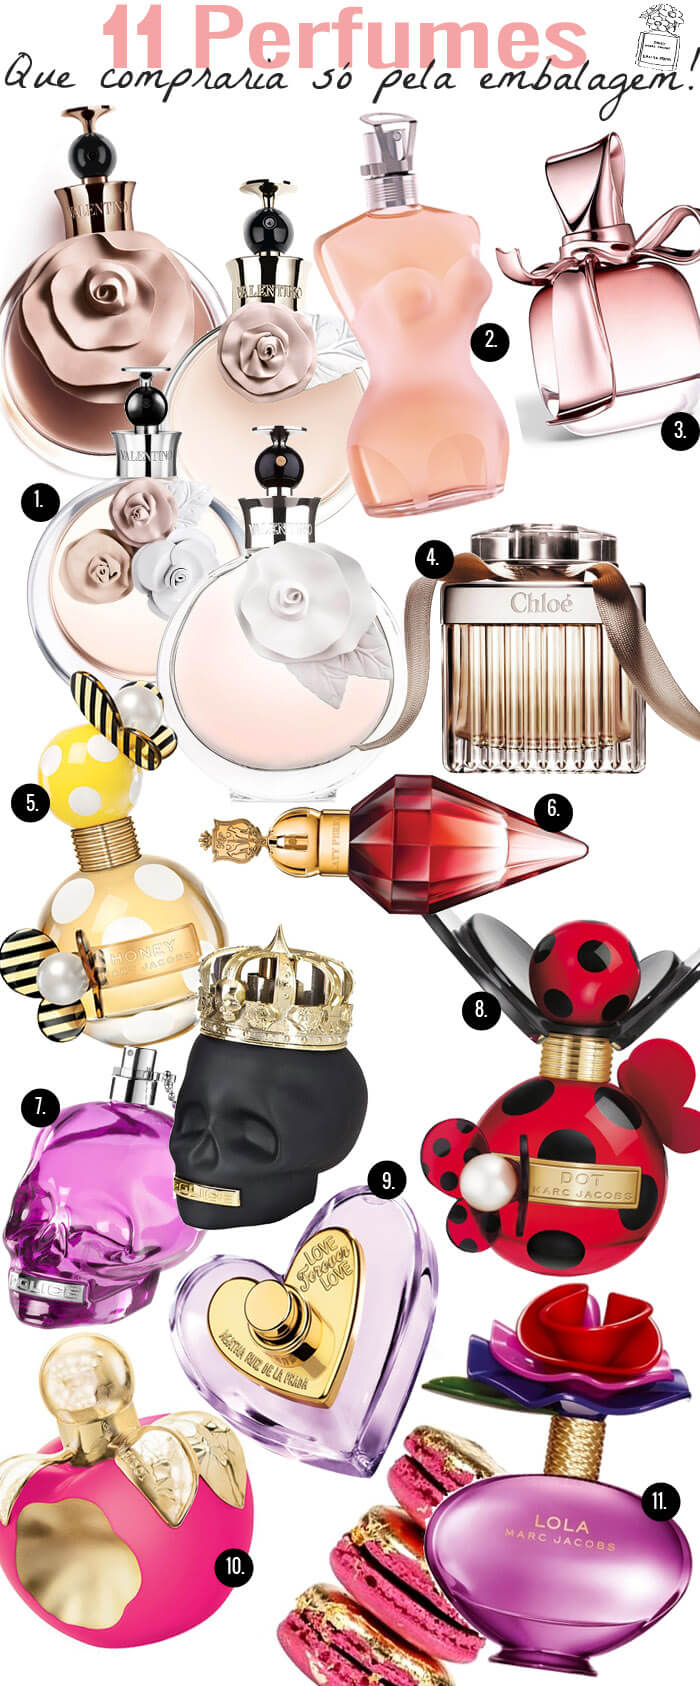 perfumes com a embalagem bonita